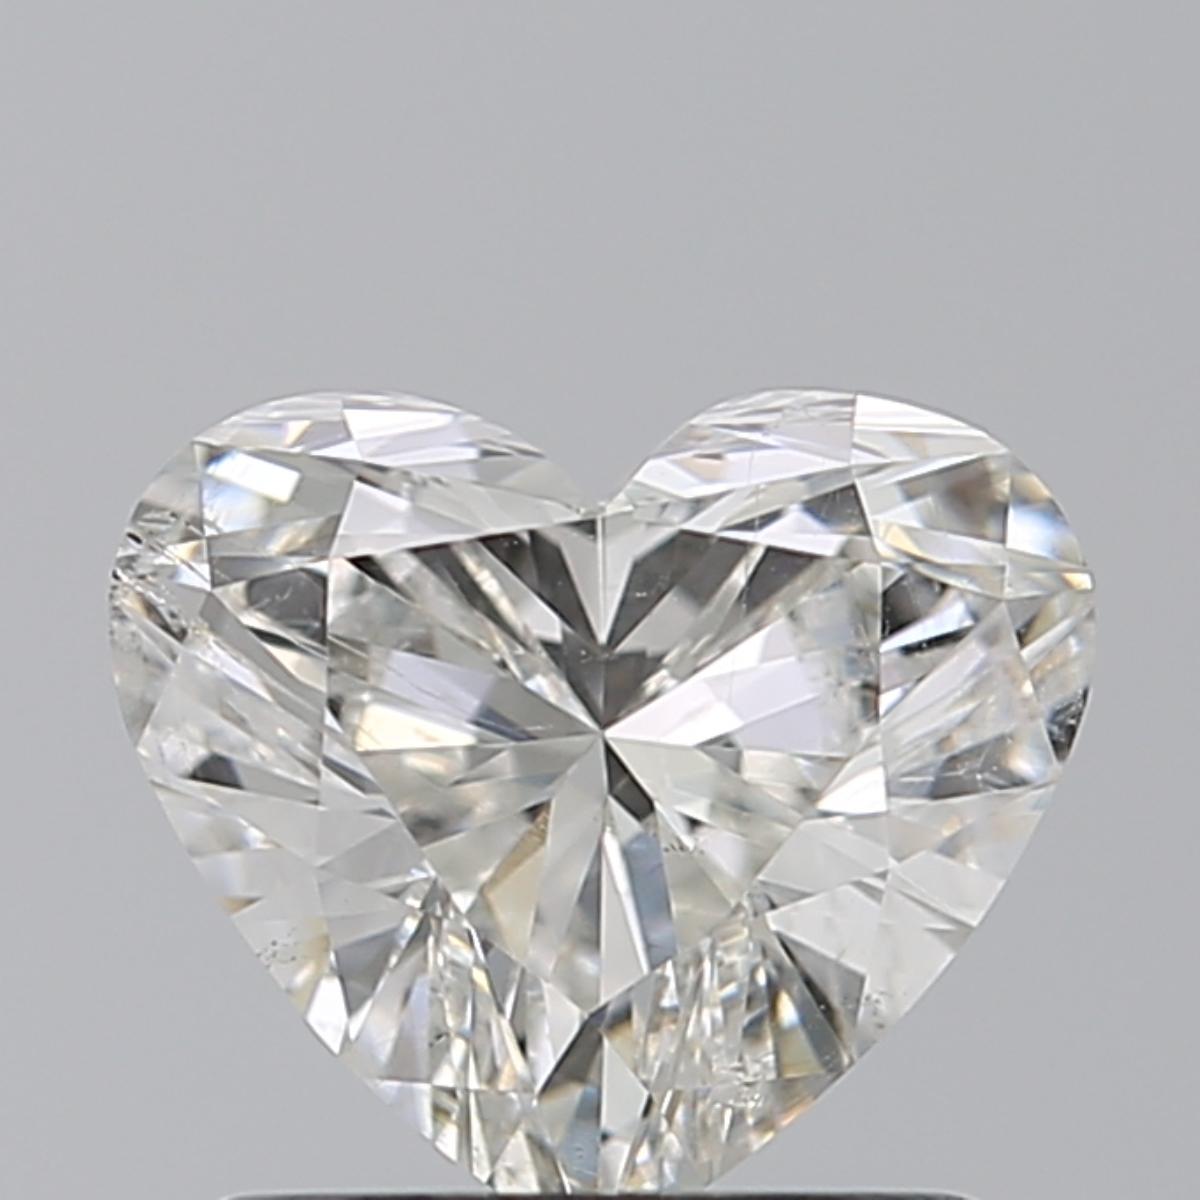 1.00 ct Heart Shape Diamond : H / SI2